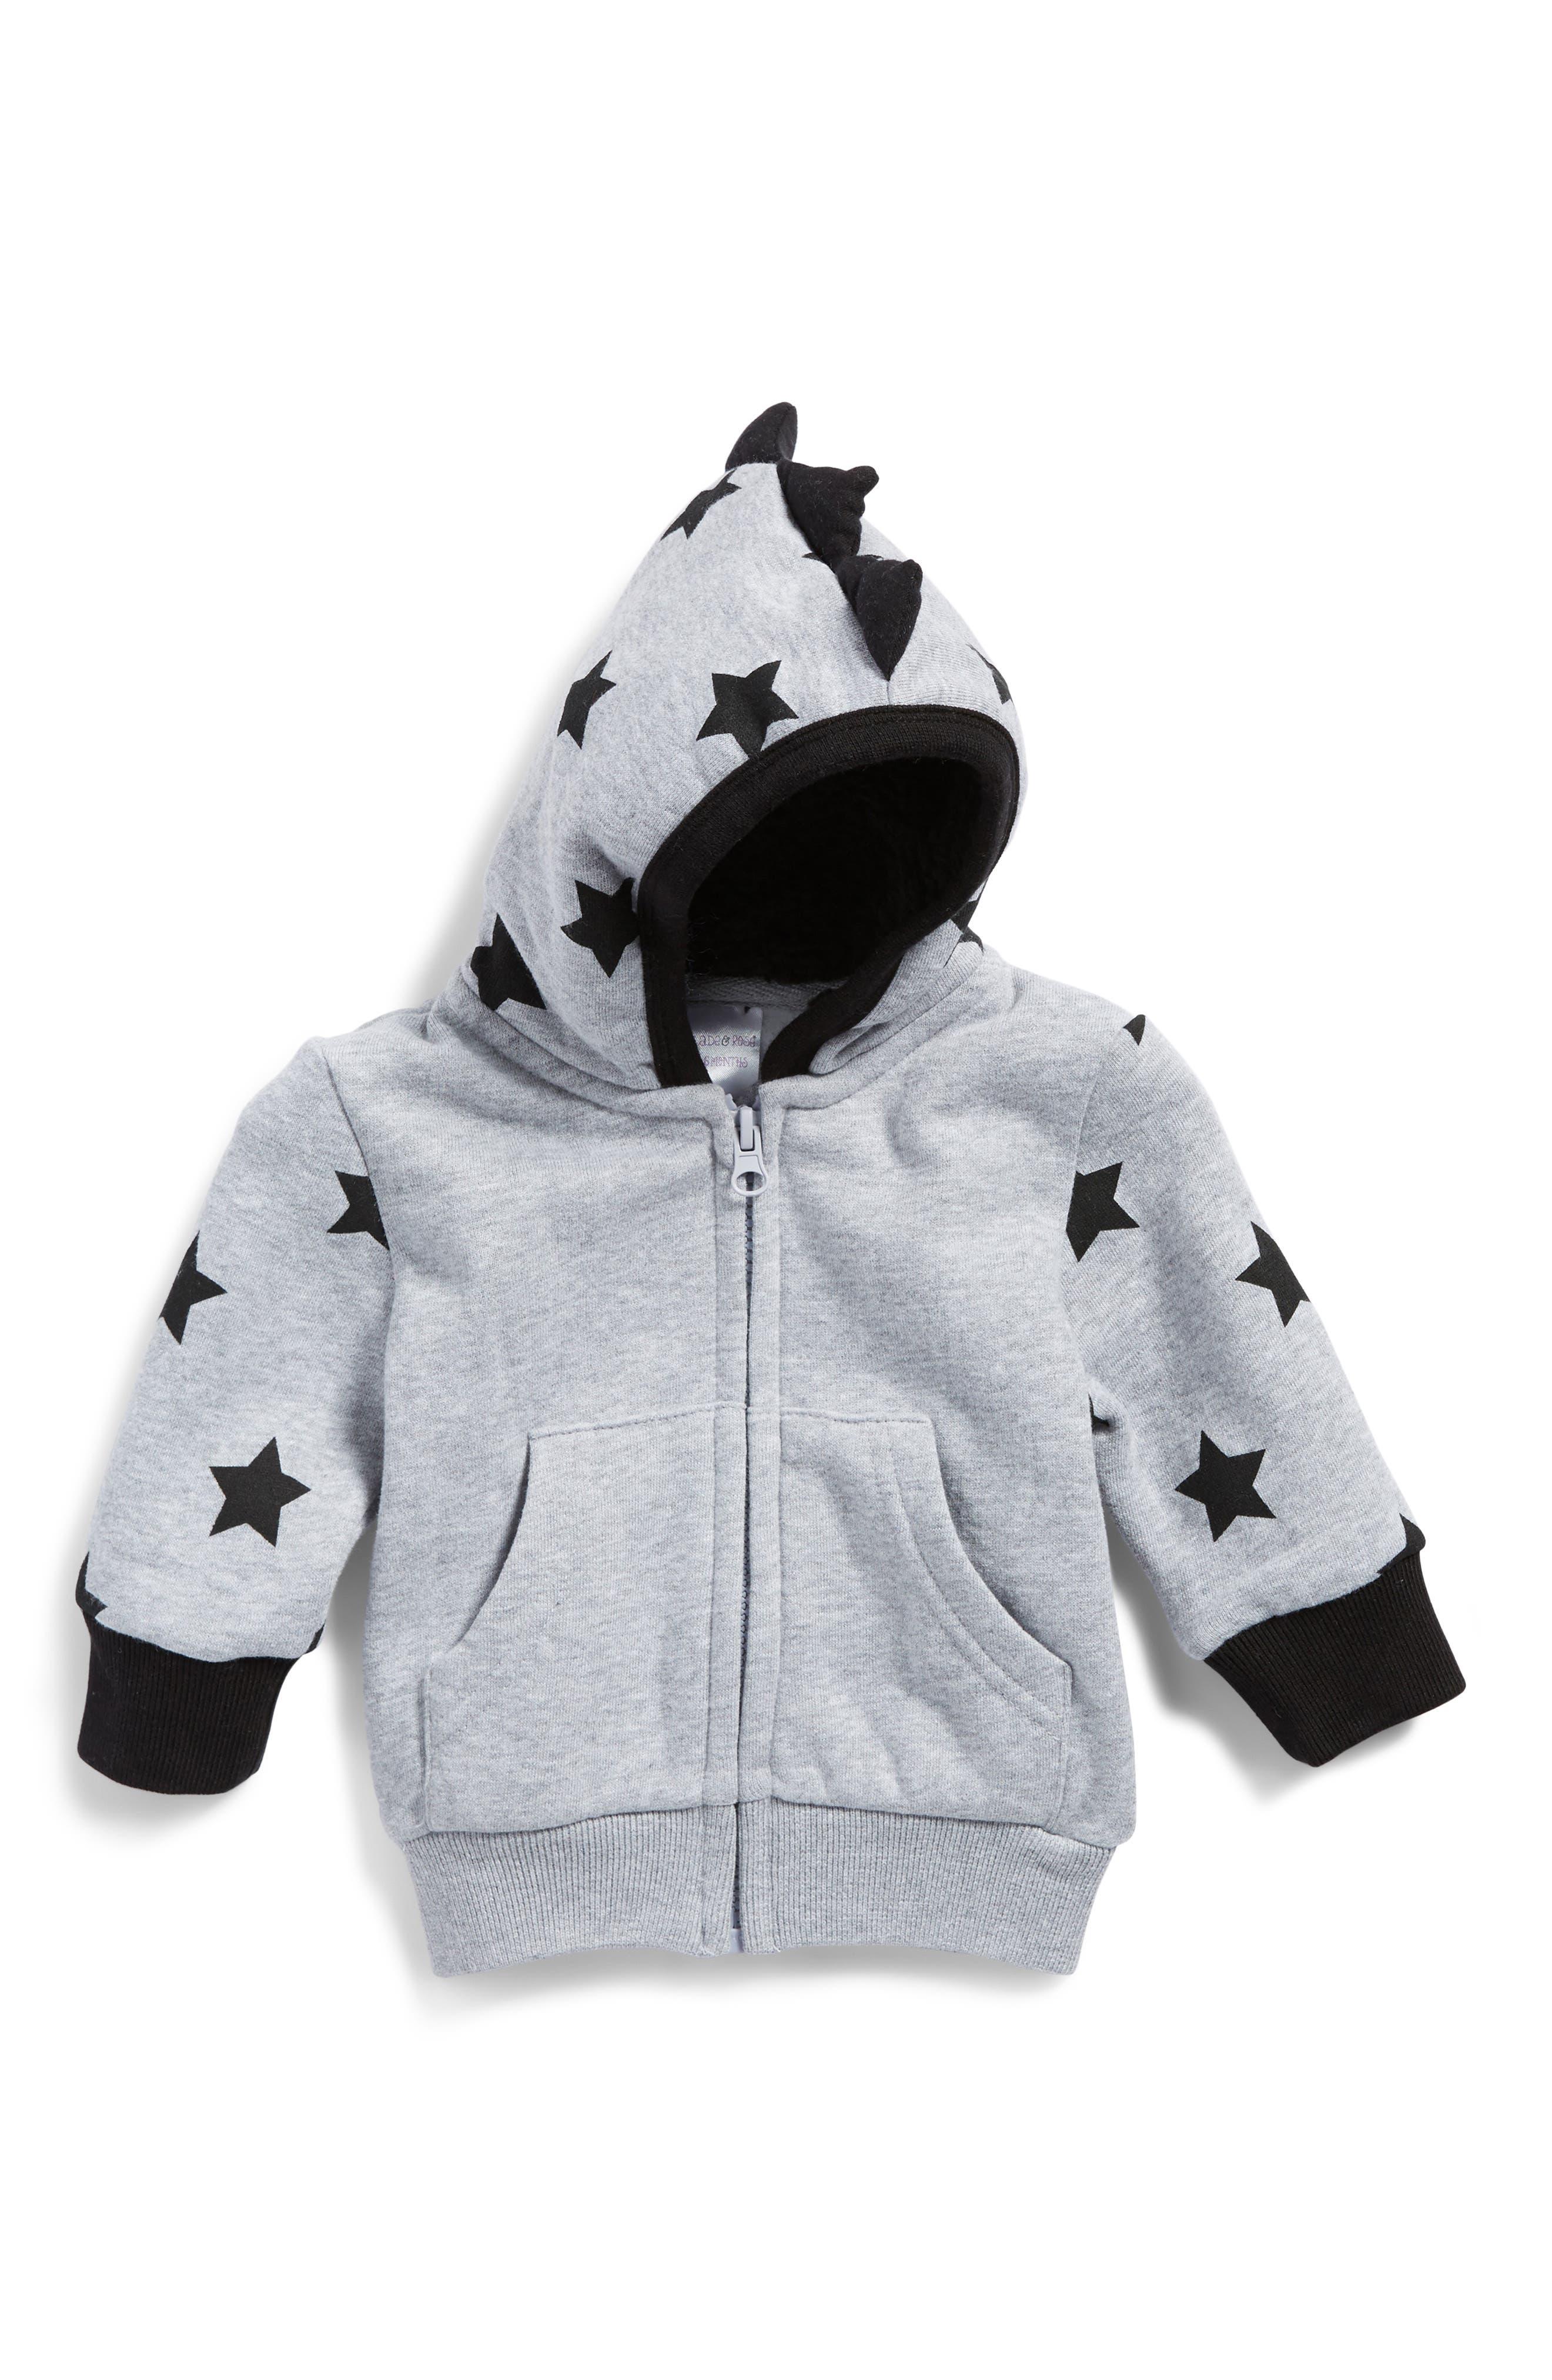 Main Image - Blade & Rose Star Print Hoodie (Baby)